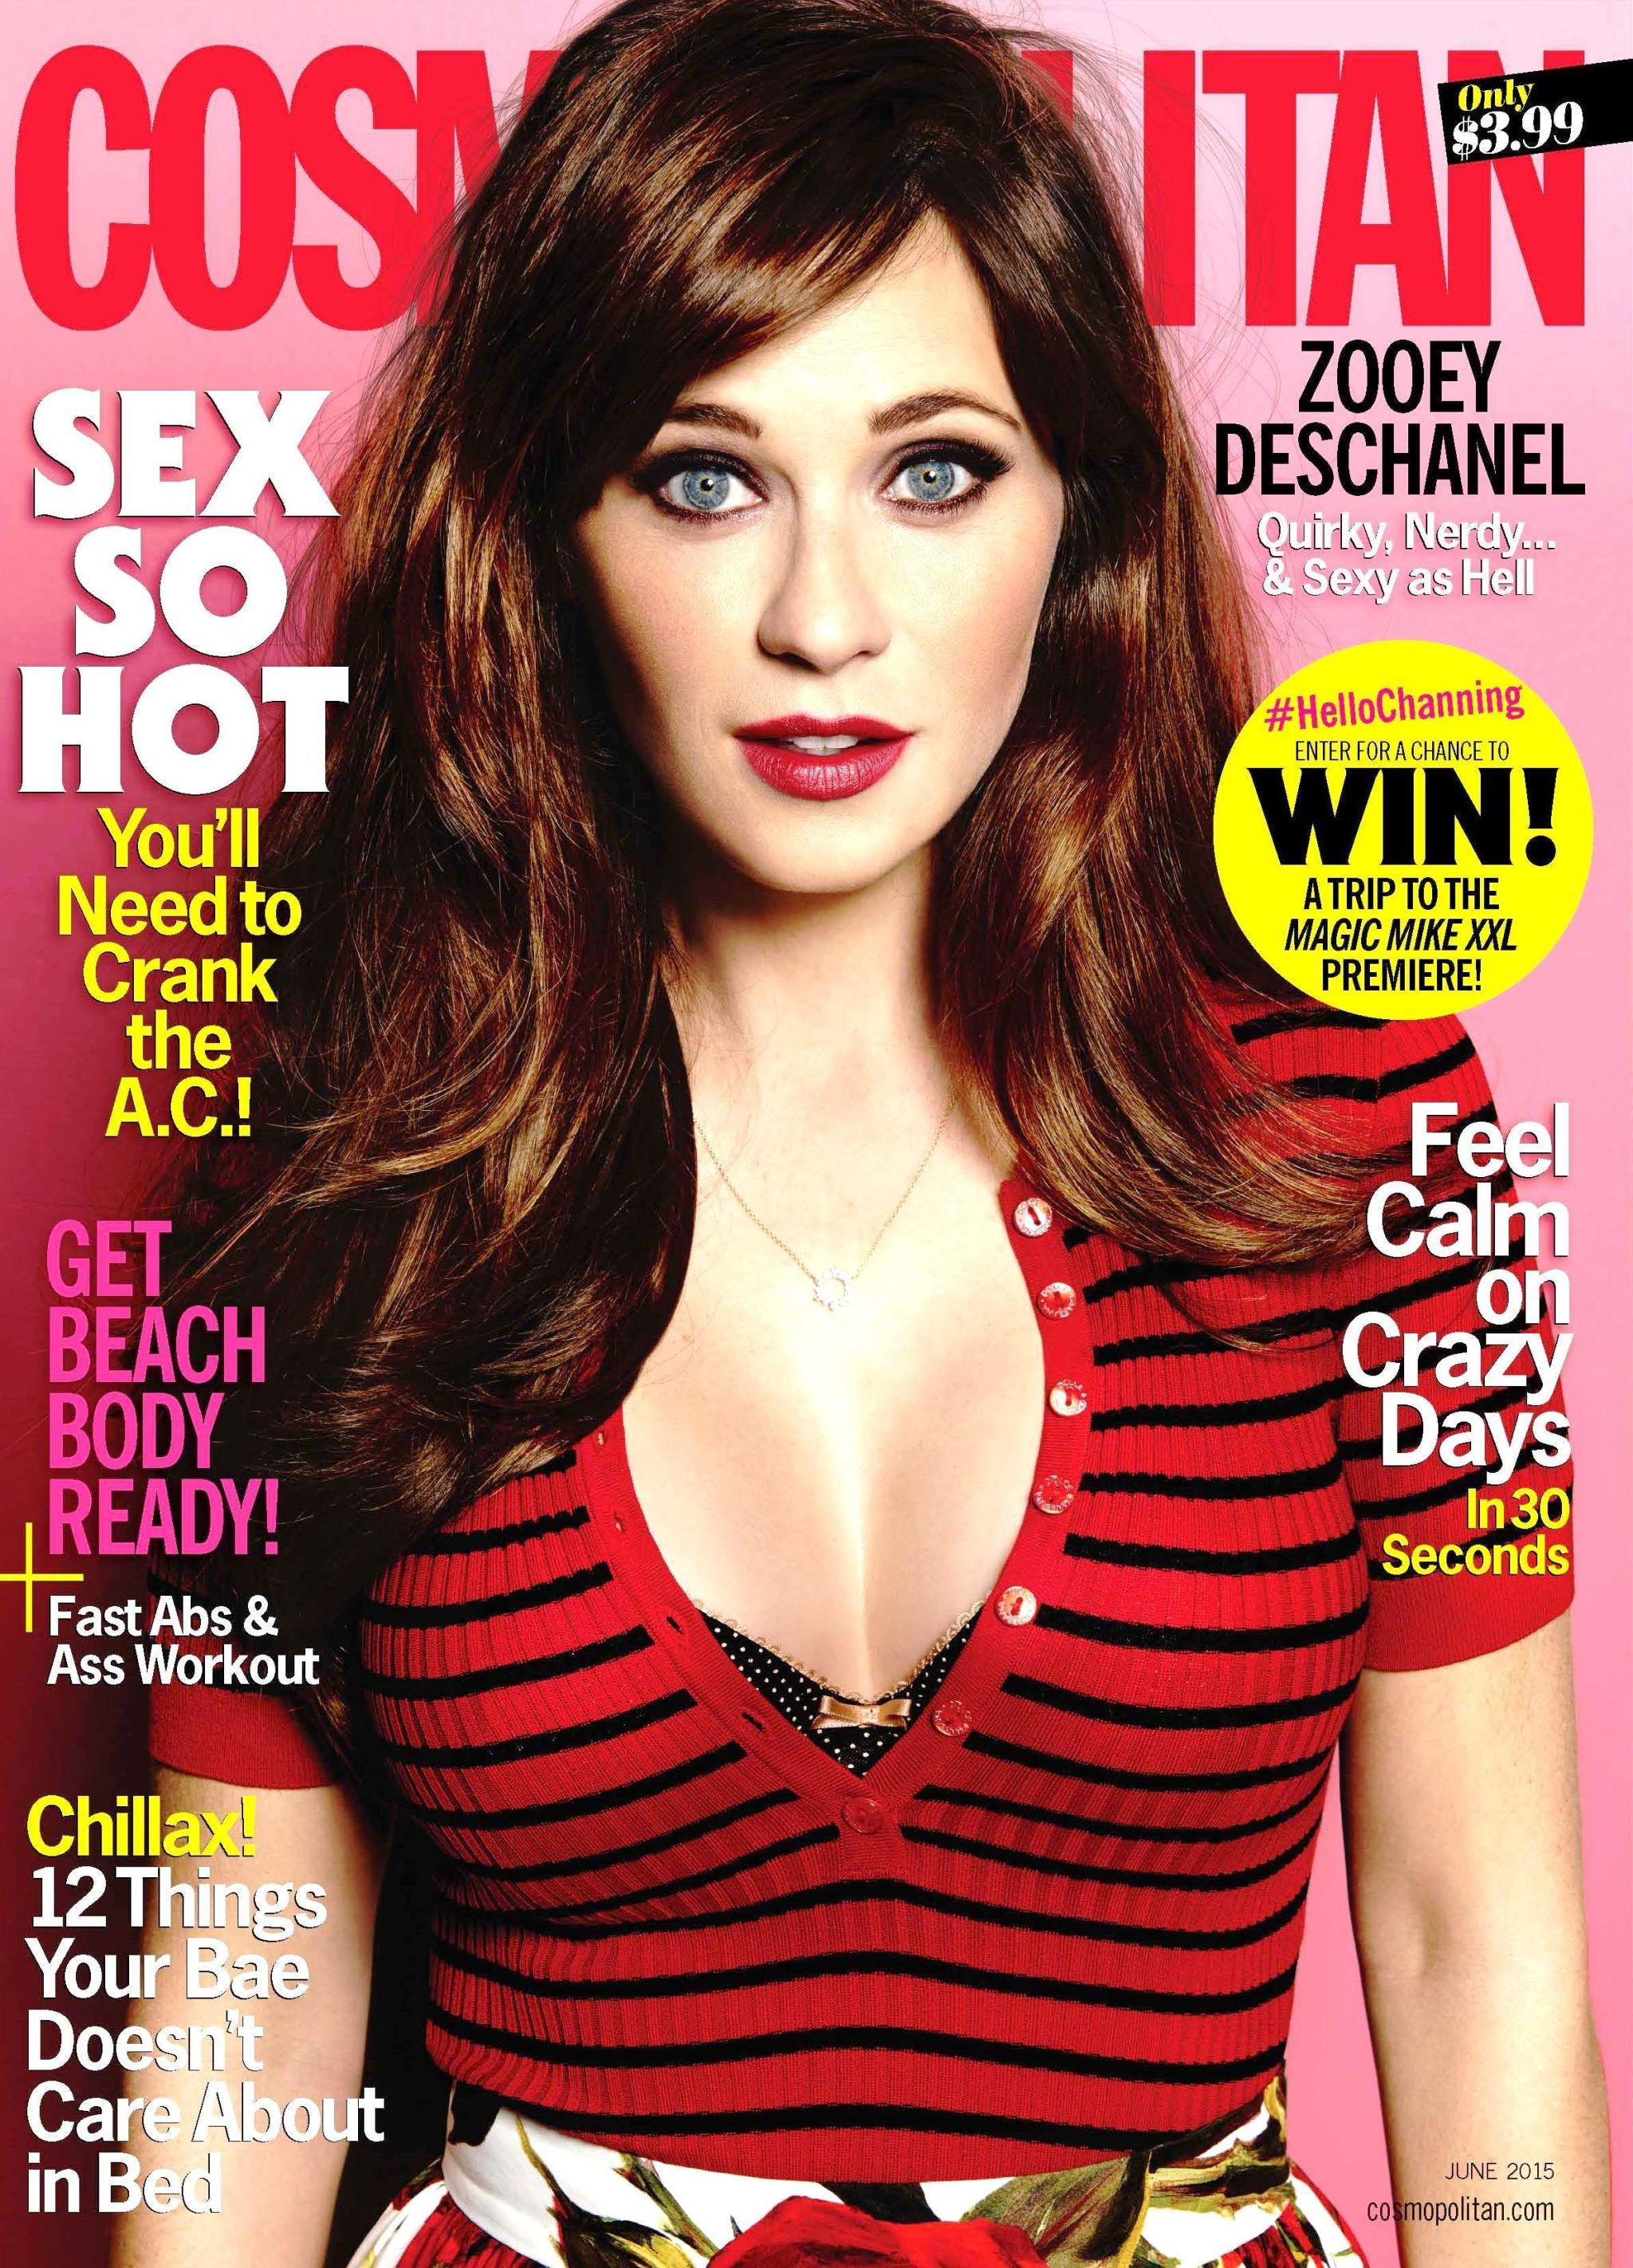 Cosmopolitan love sexual health